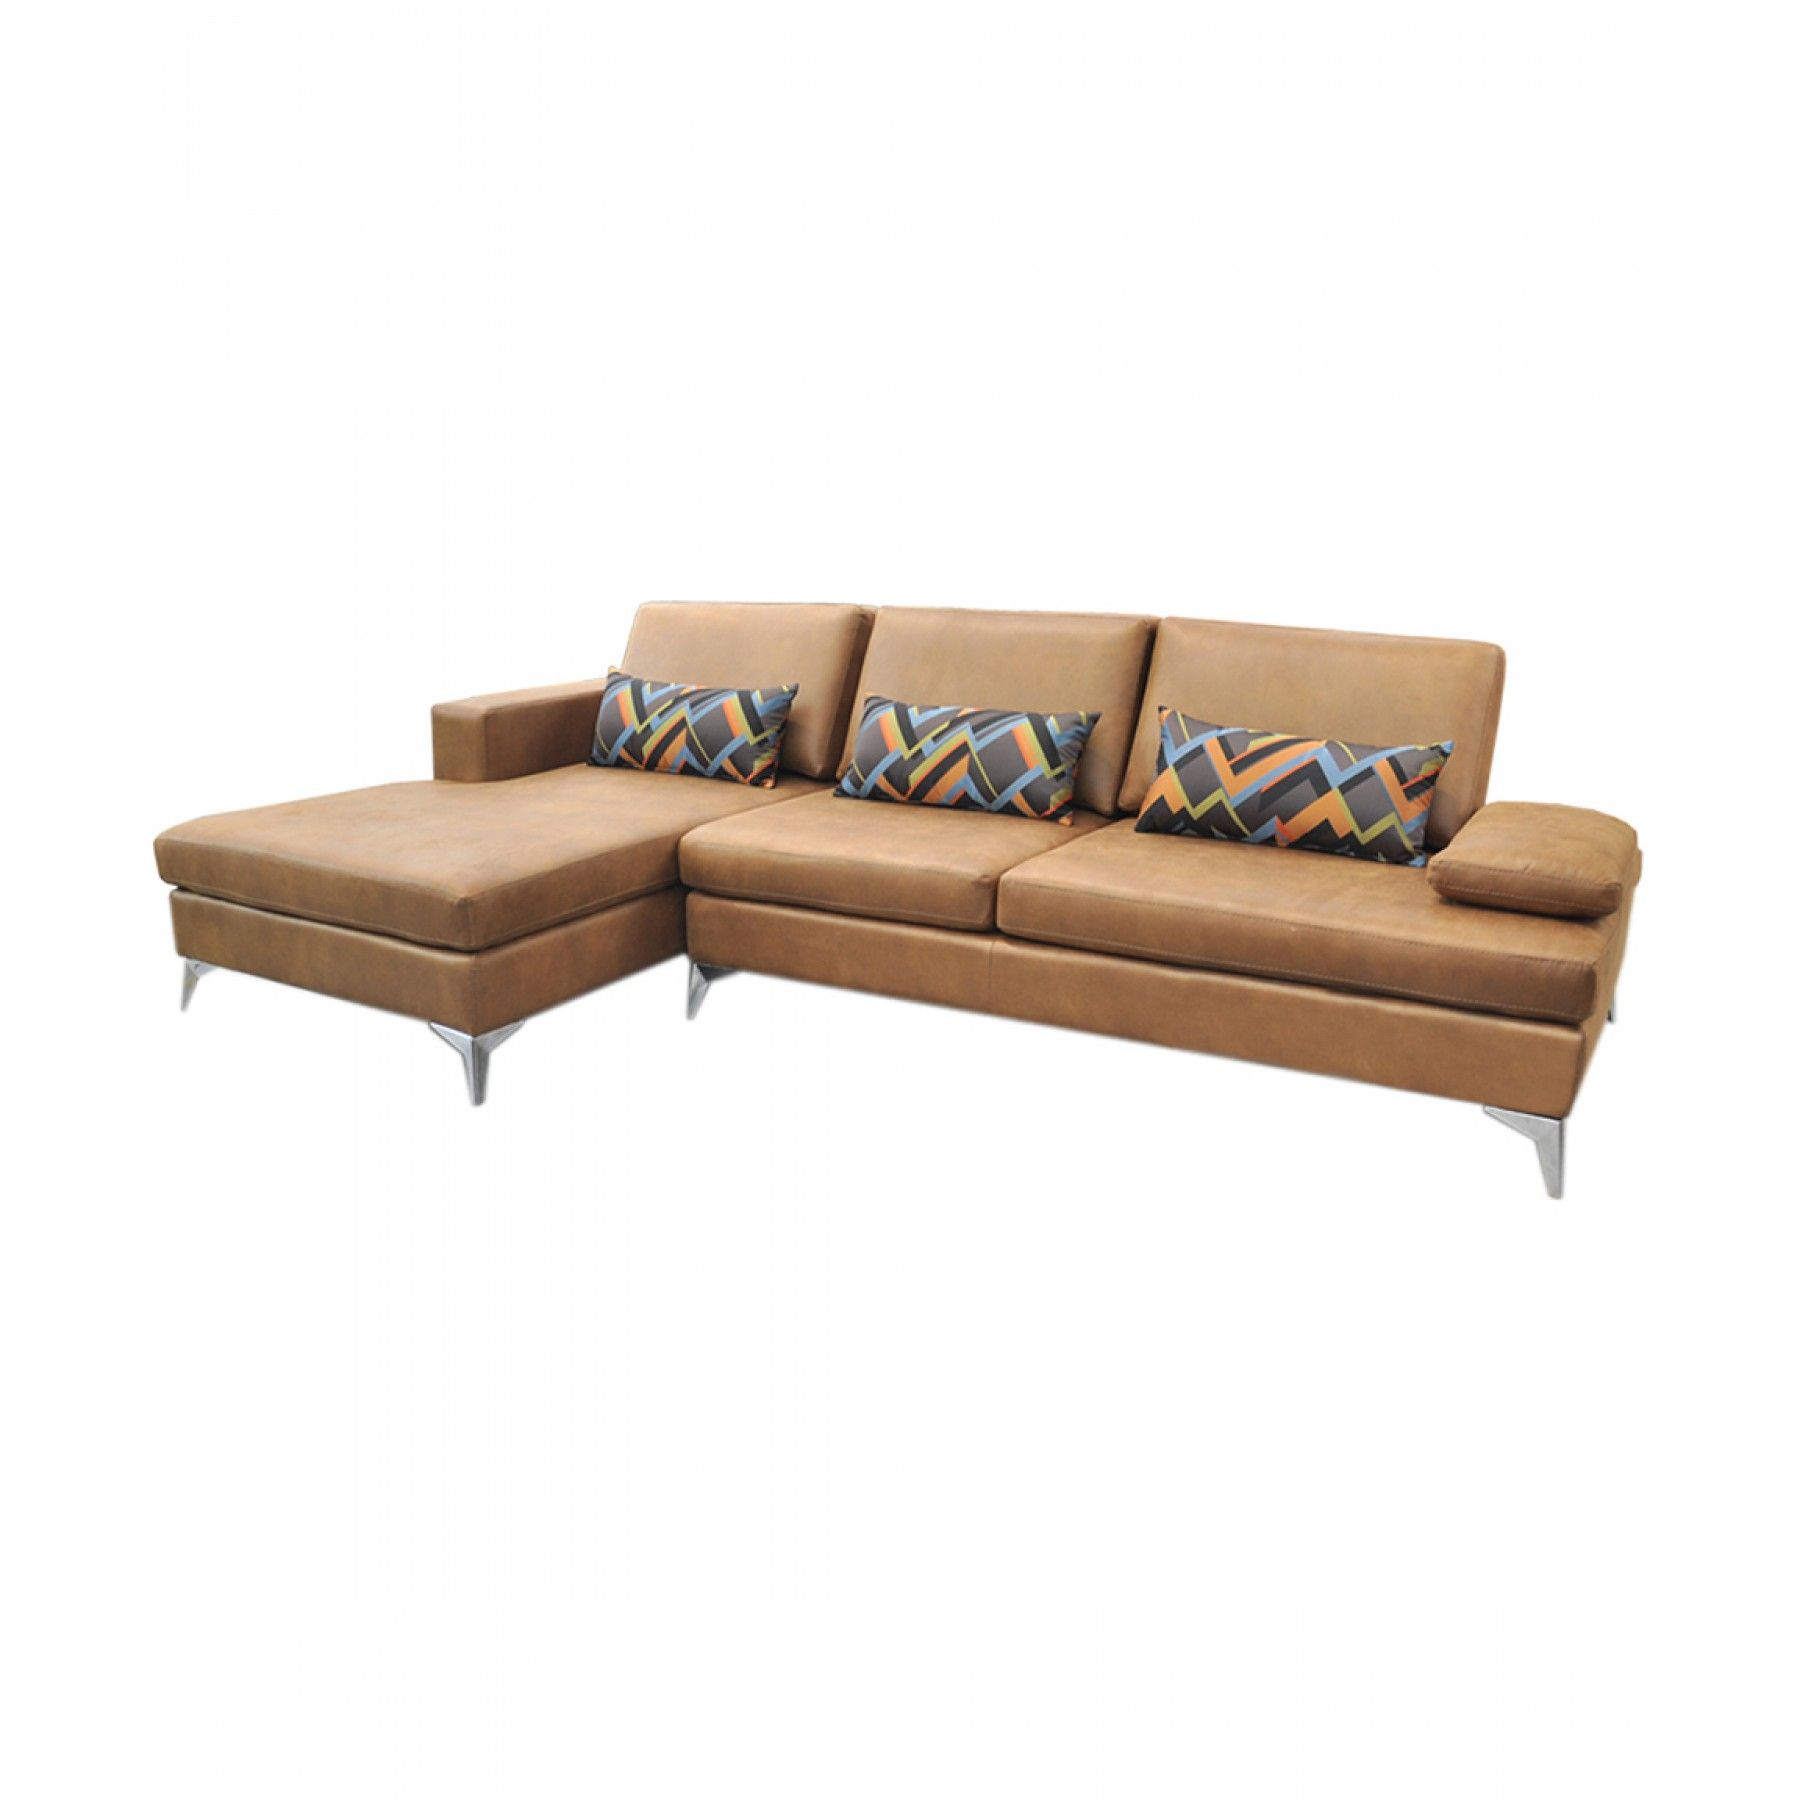 Muebles dico sofa cama obtenga ideas dise o de muebles for Muebles de sala promart